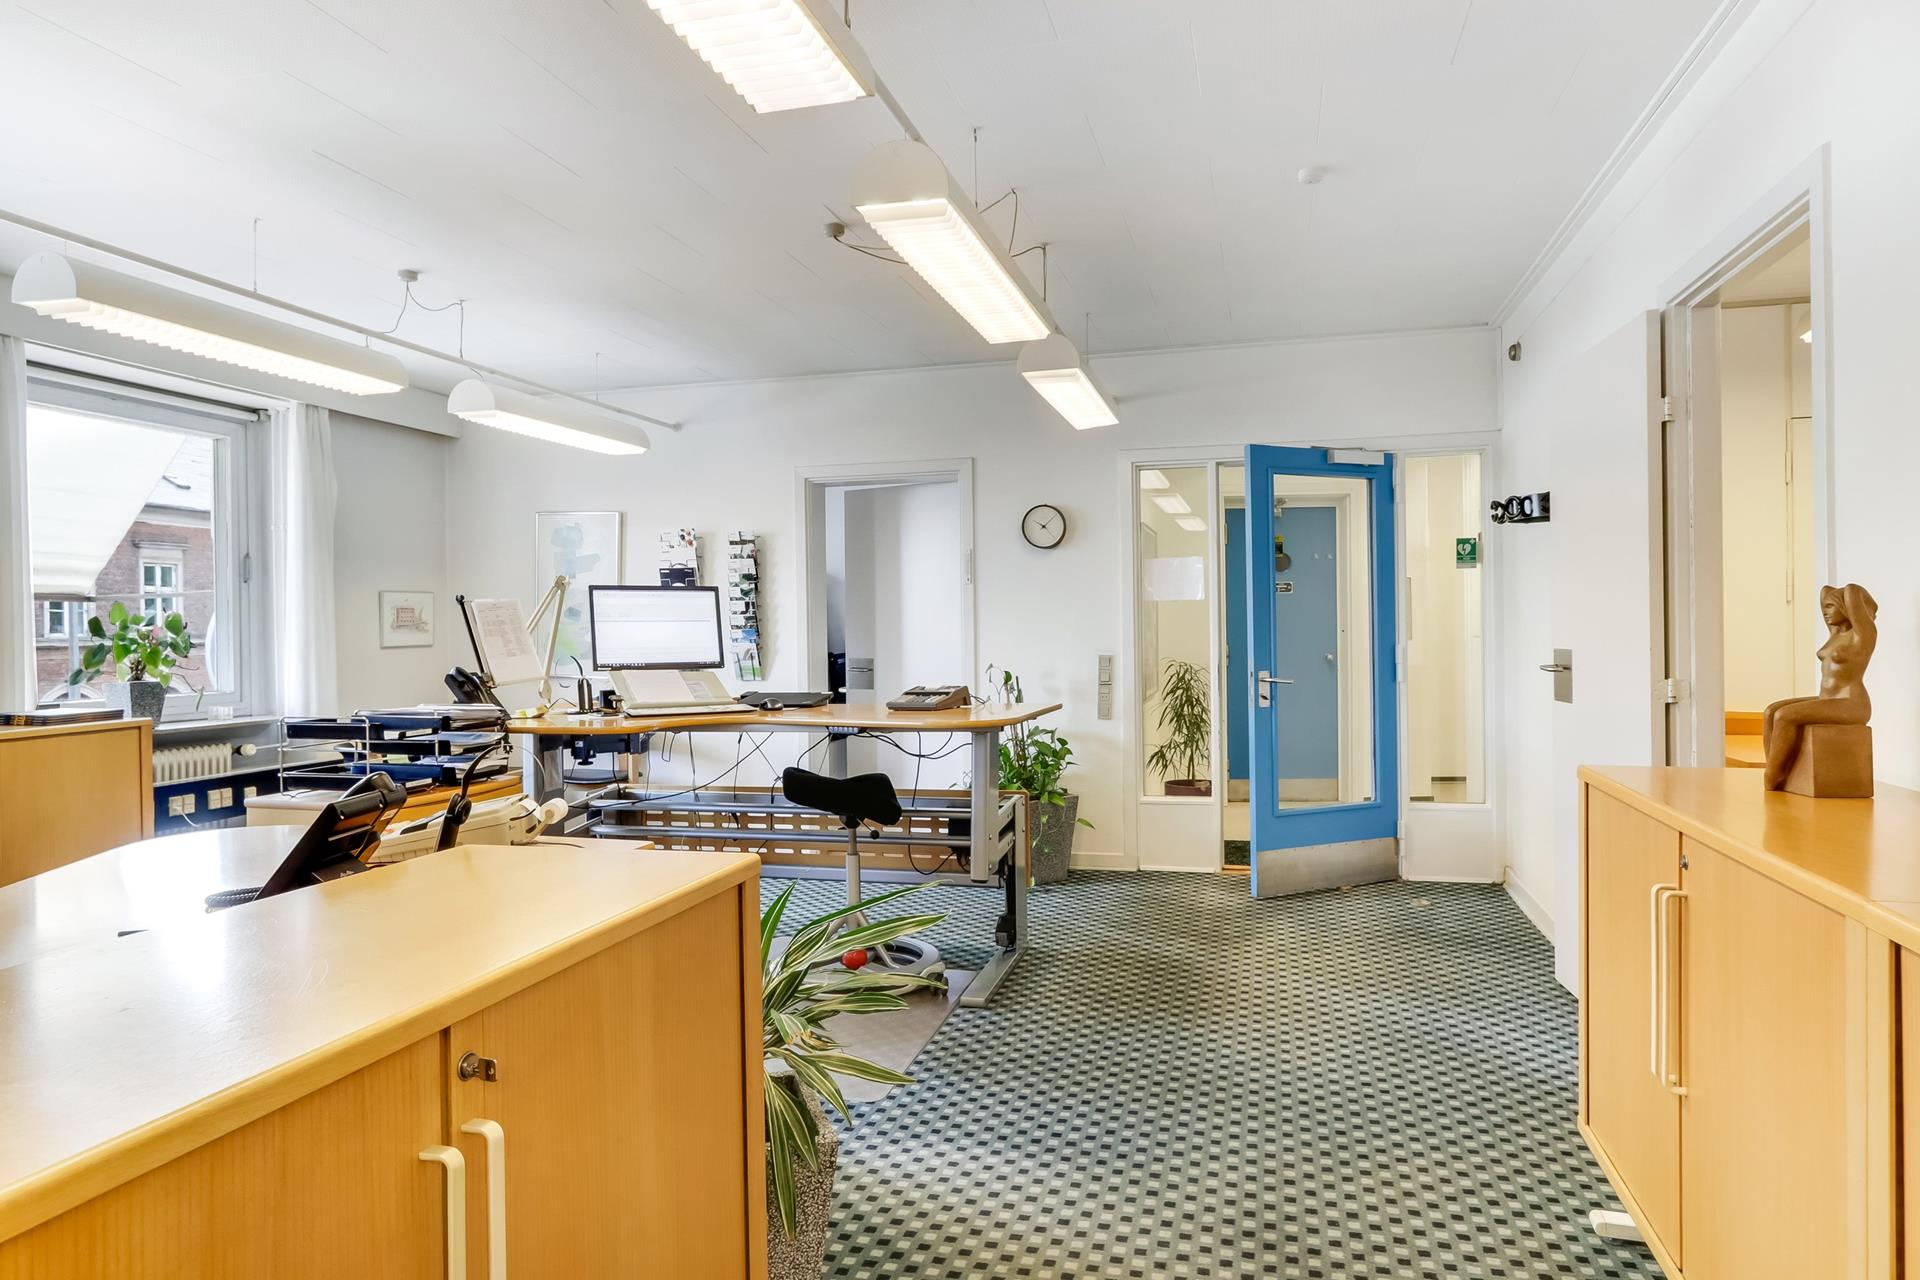 Bolig/erhverv på Klosterplads i Svendborg - Andet